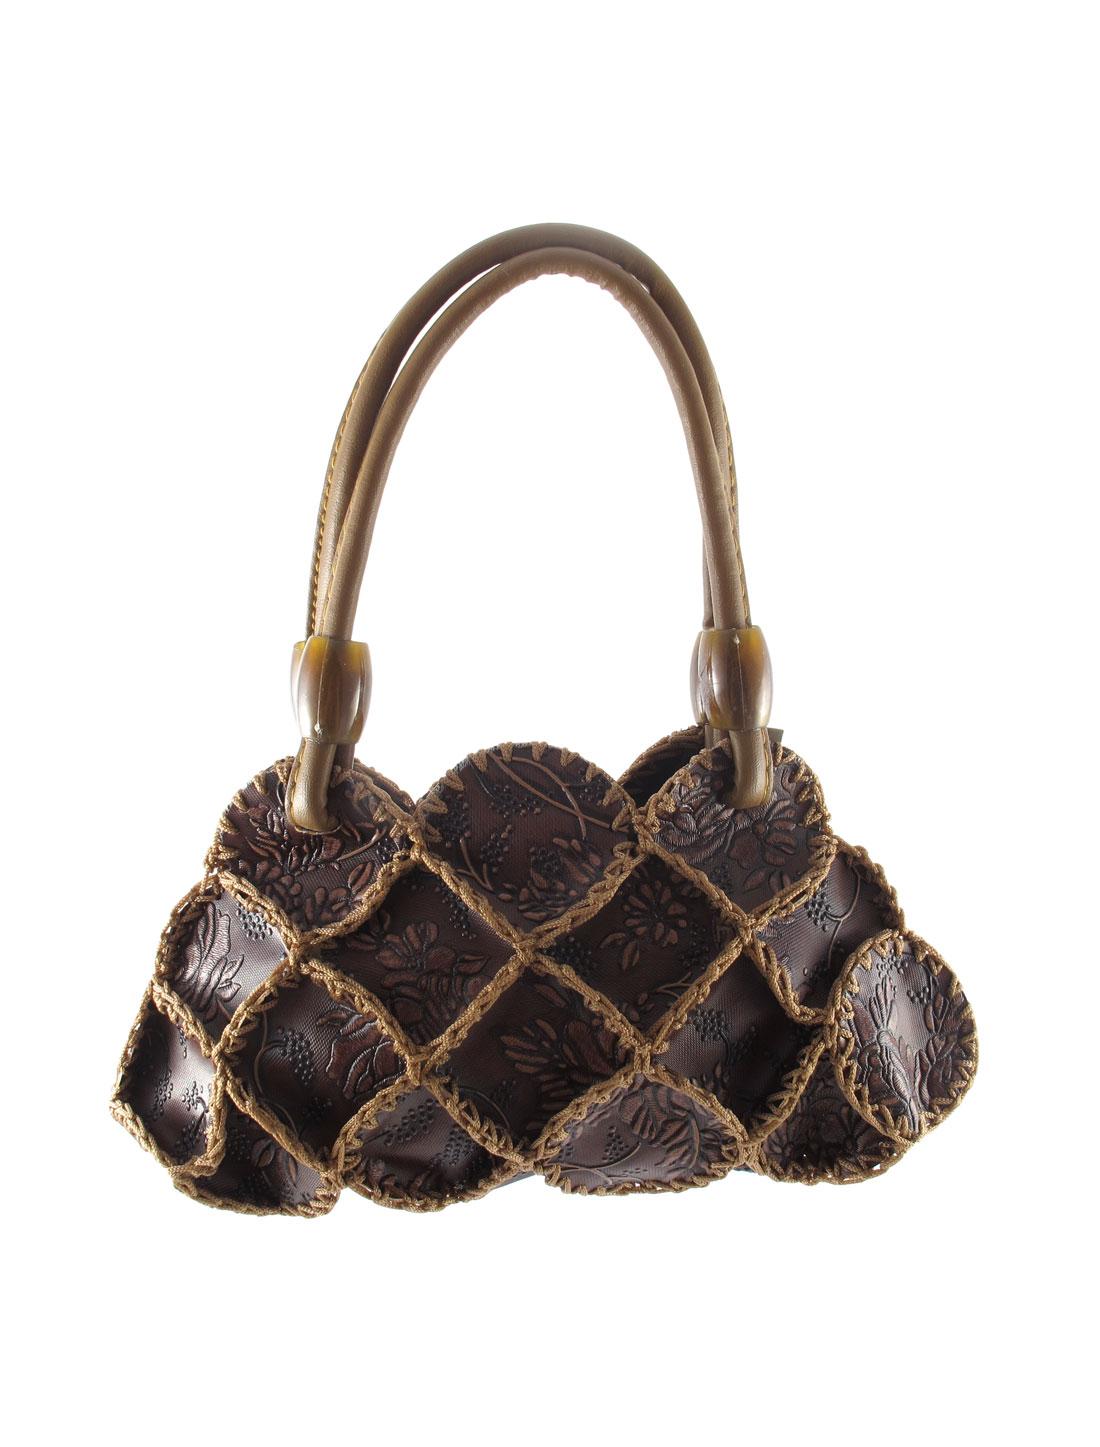 Lady Faux Leather Braided Flowers Detail Satchel Bag Handbag Coffee Color